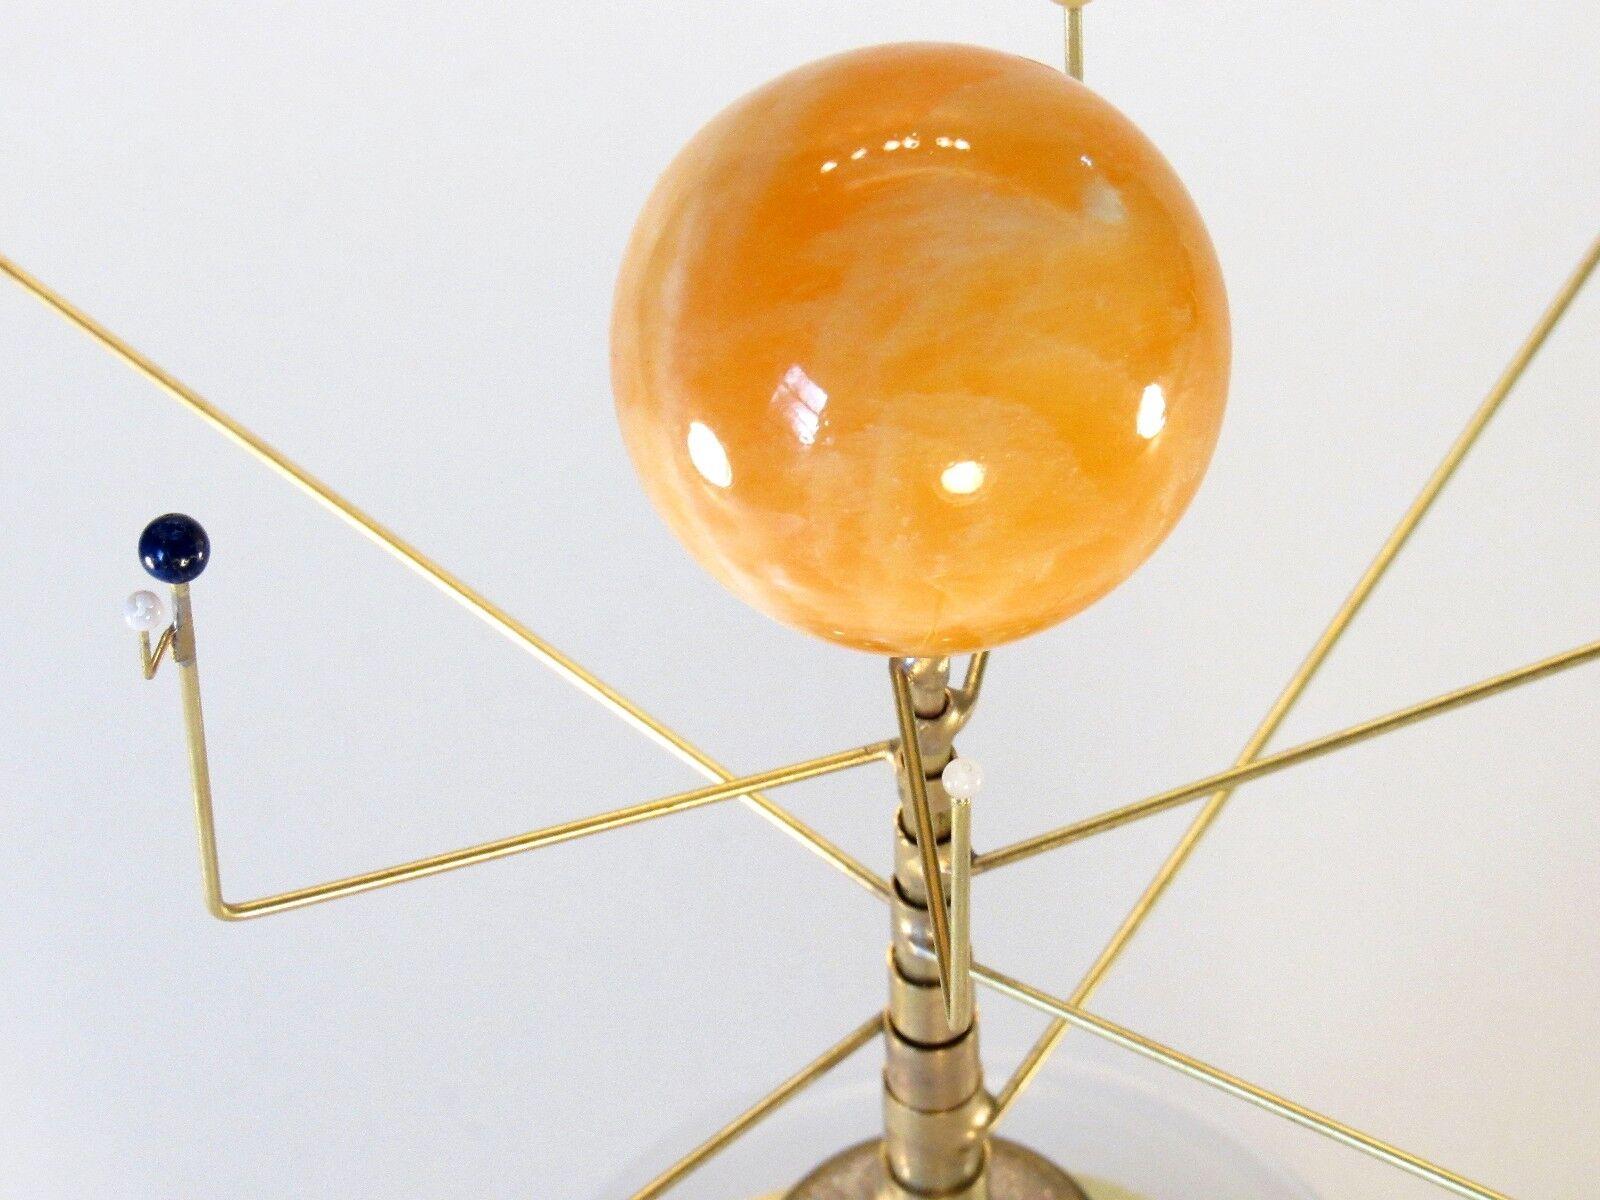 brass orrery solar system - photo #13